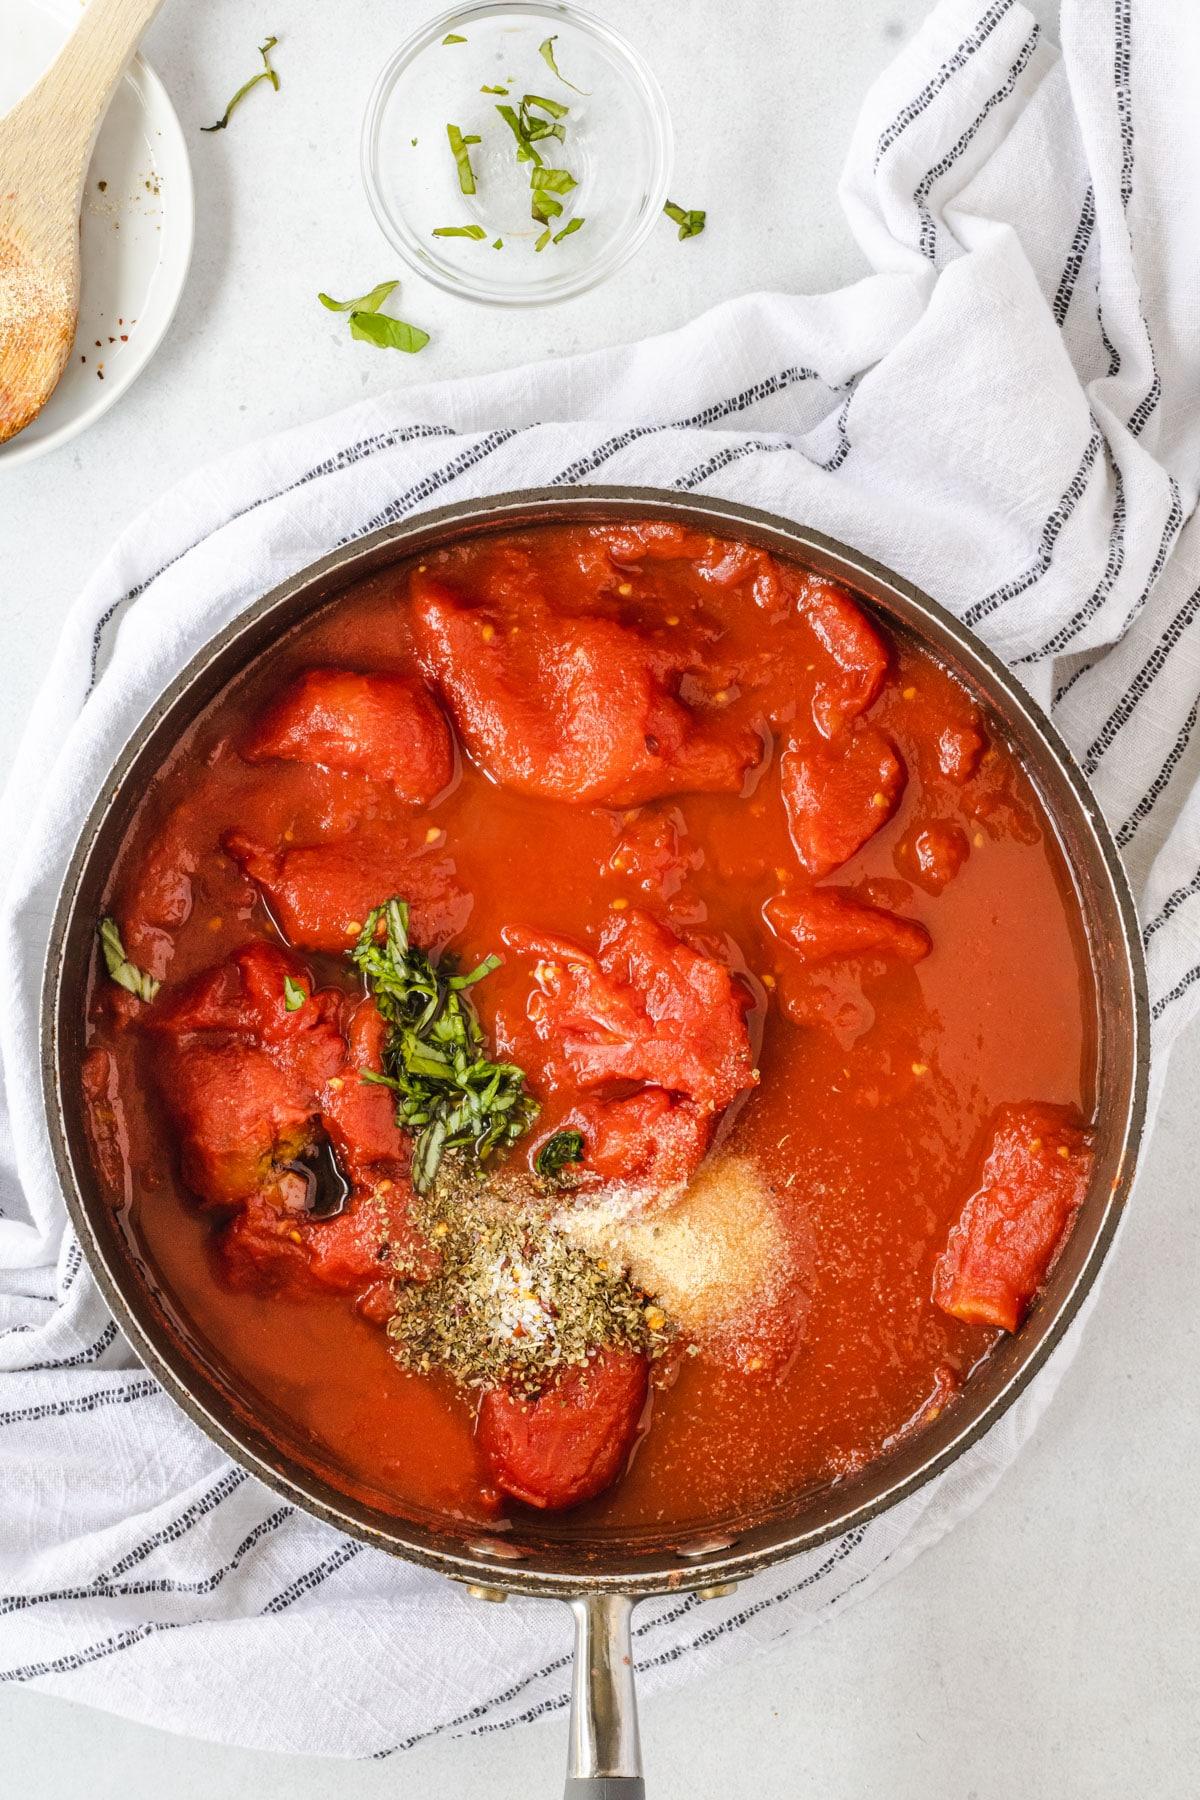 Hearty marinara sauce ingredienets in pan.